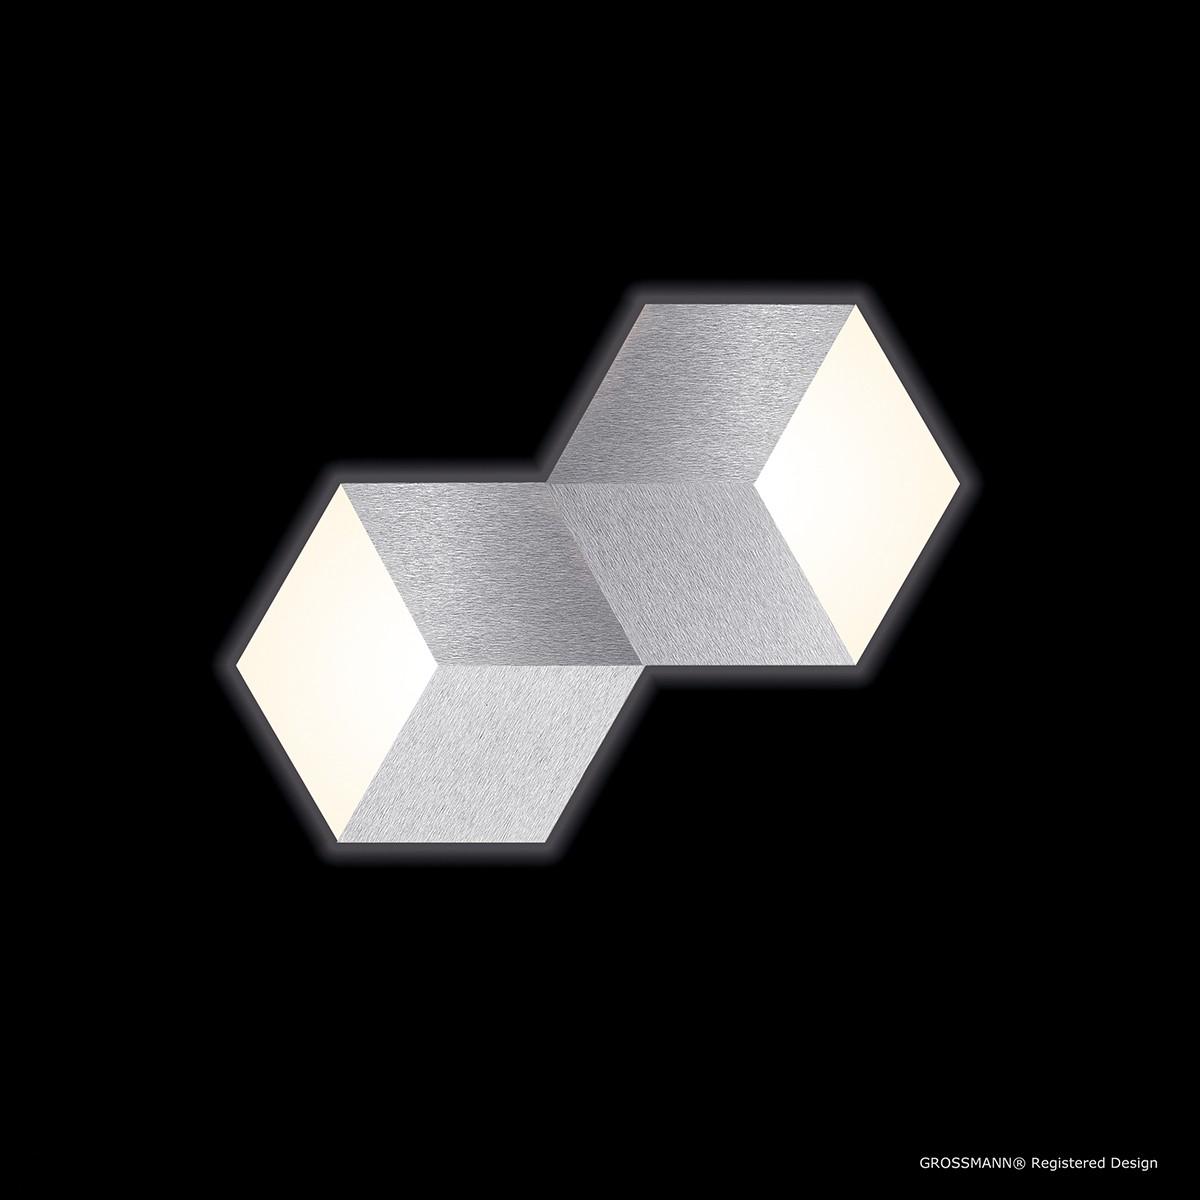 Grossmann Geo LED Wand- / Deckenleuchte, 2-flg., Aluminium gebürstet